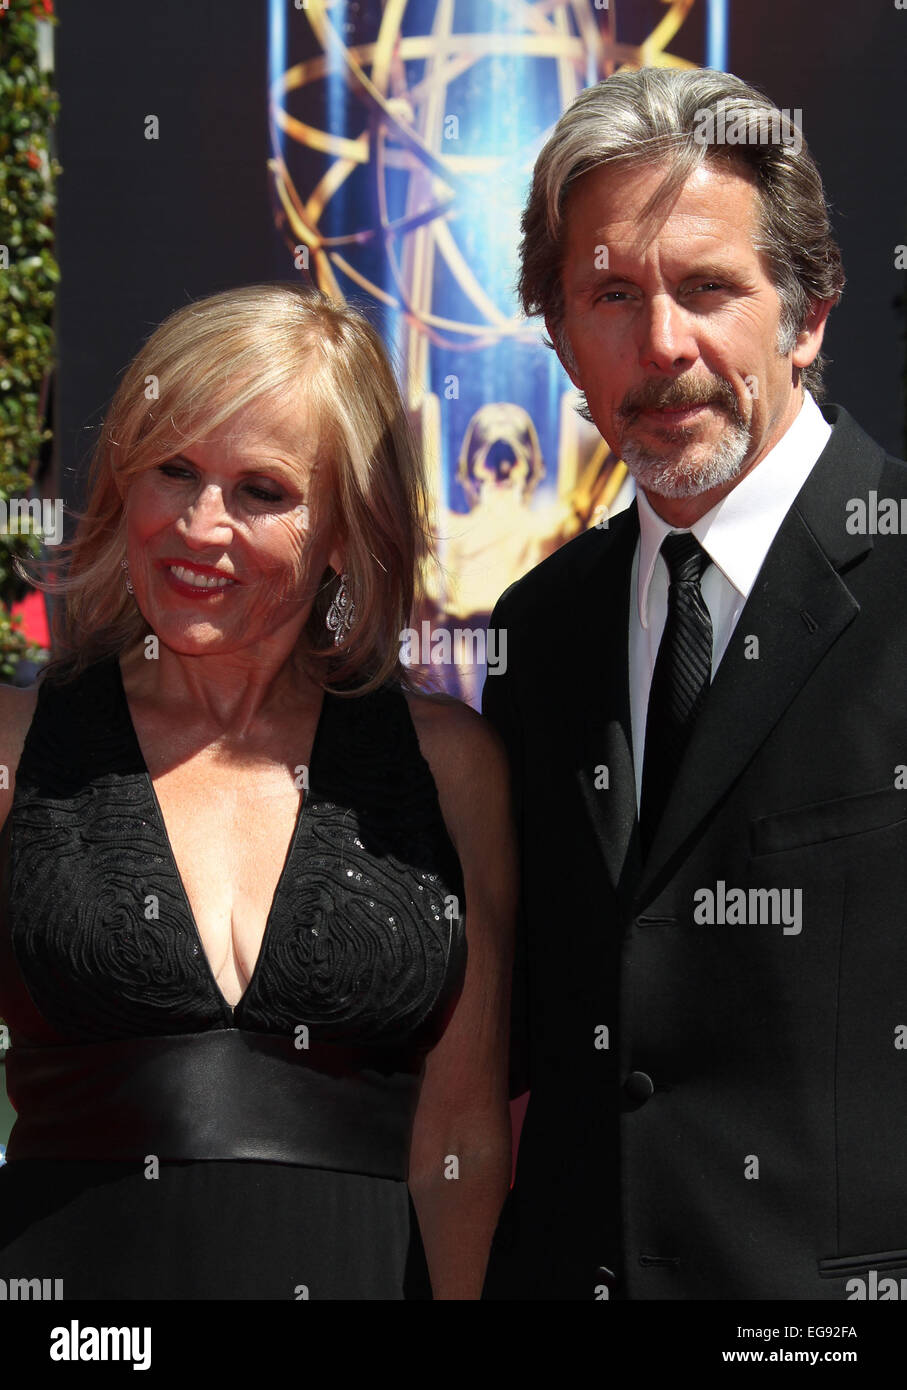 Susie Essman born May 31, 1955 (age 63) Hot clip Cheryl Holdridge,Gloria LeRoy